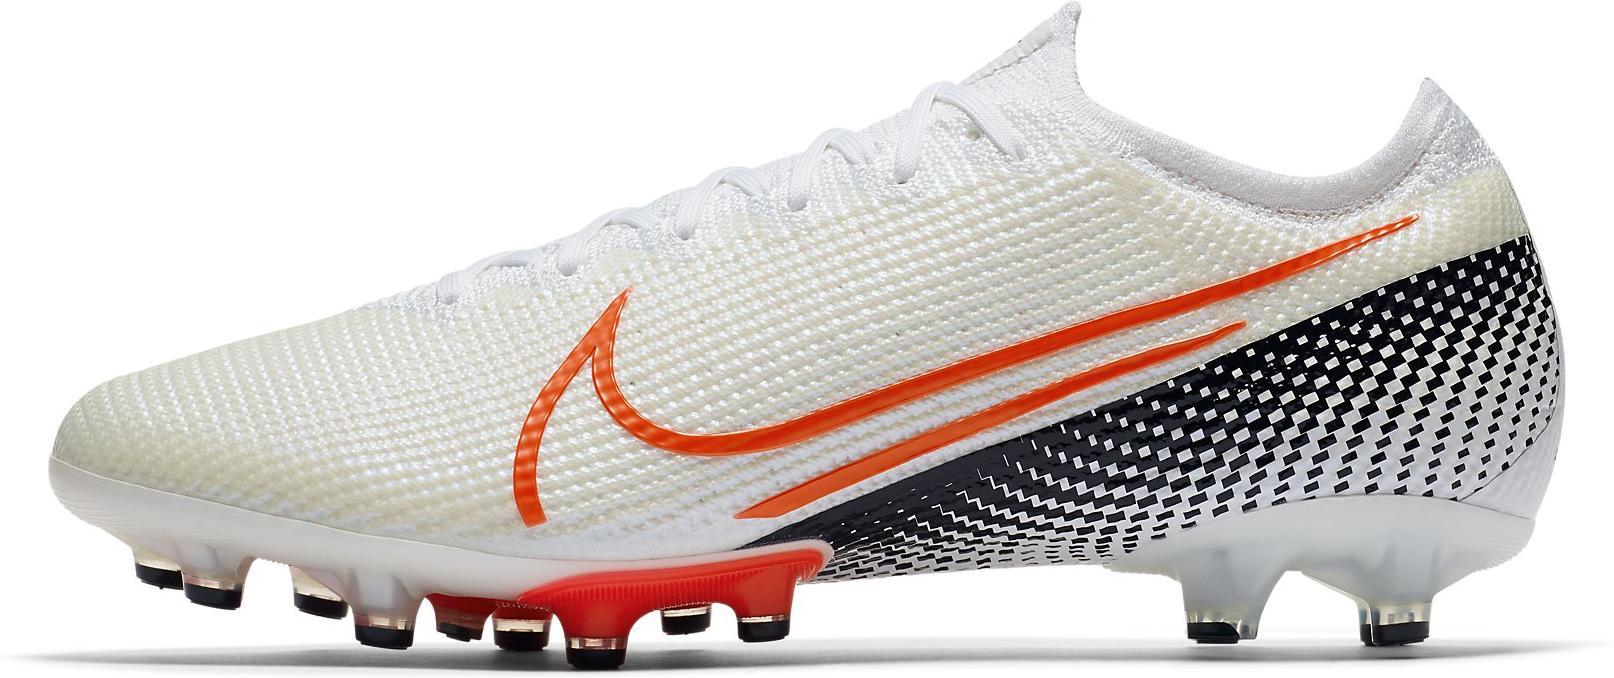 Pánské kopačky Nike Mercurial Vapor 13 Elite AG-PRO